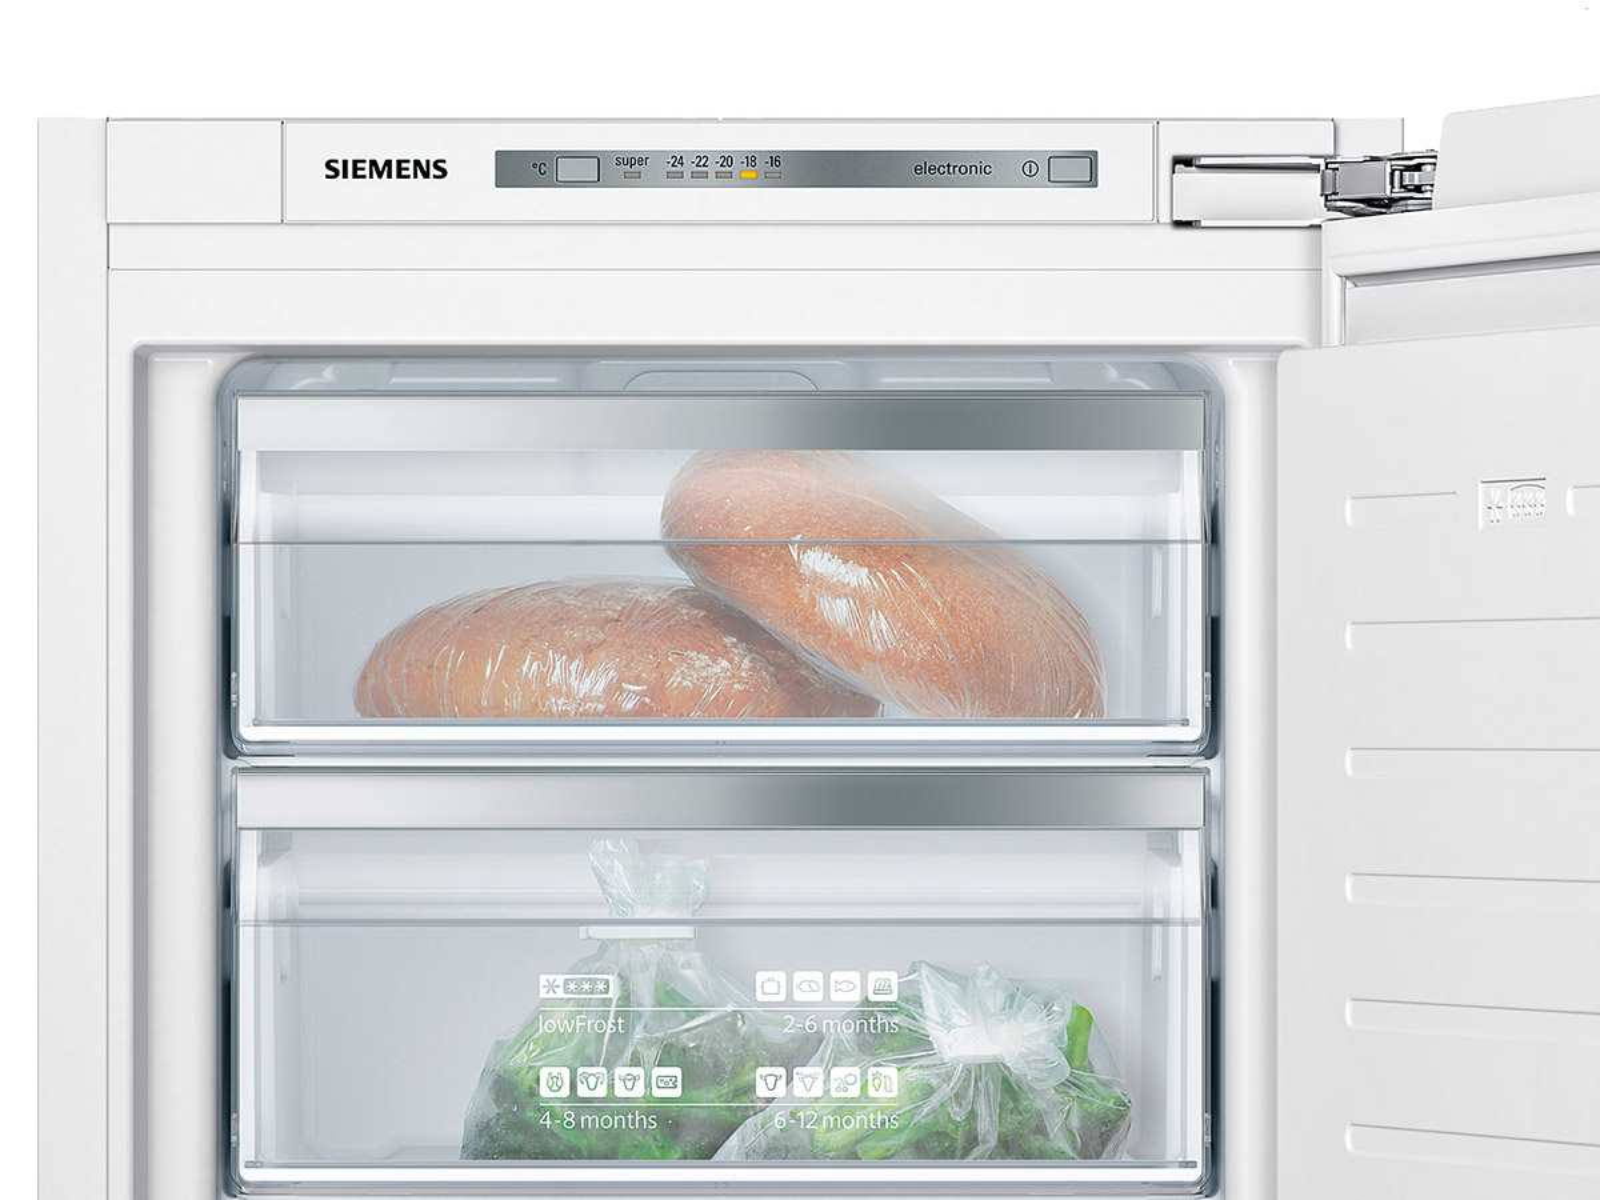 siemens kx41fv110 einbau-kühl-gefrierschrank-set ki41fad30 + gi11vad30 - Einbau Küchengeräte Set